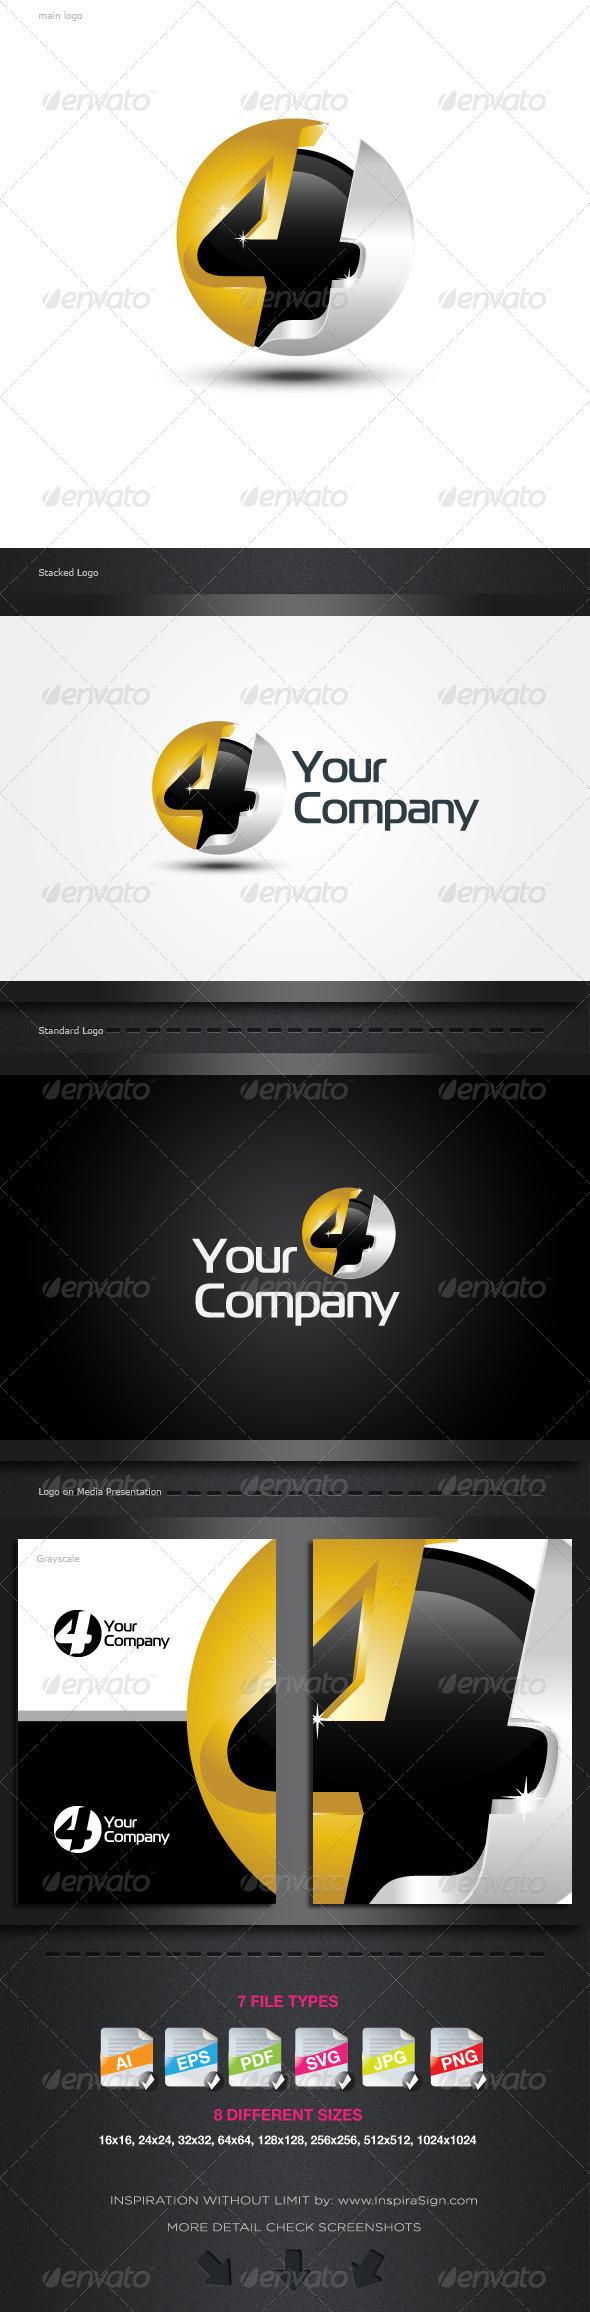 "3D/2D ""4"" Symbol Logo by Romaa Roma, via Behance"